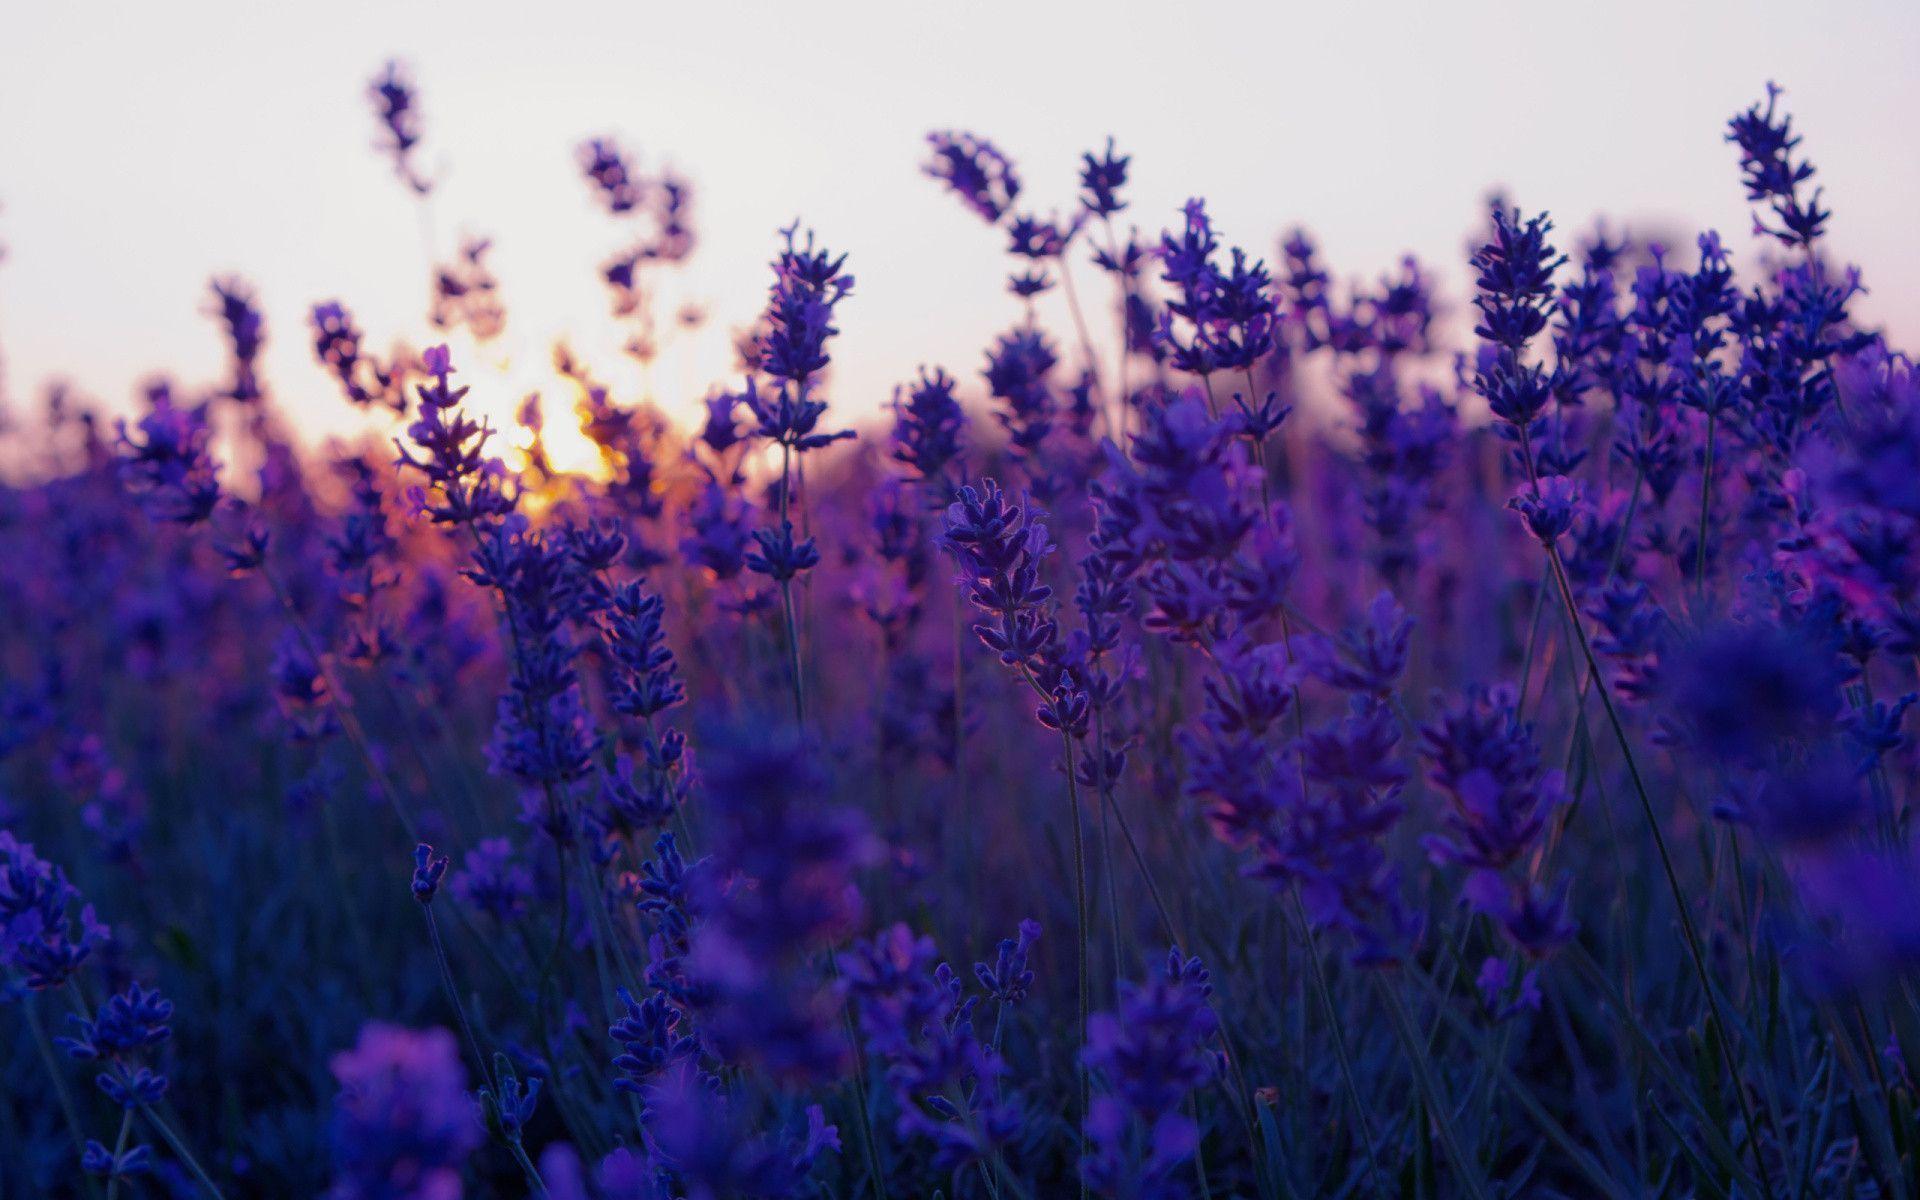 Aesthetic Flower Wallpapers , Top Free Aesthetic Flower